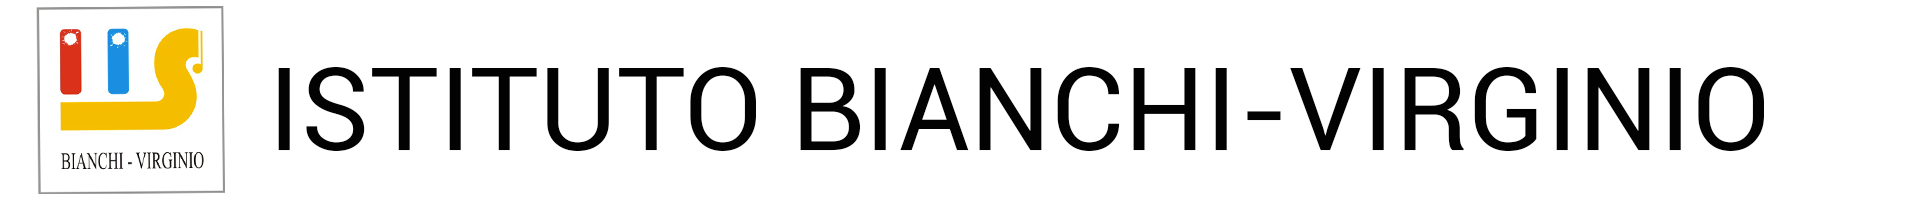 Bianchi Virginio